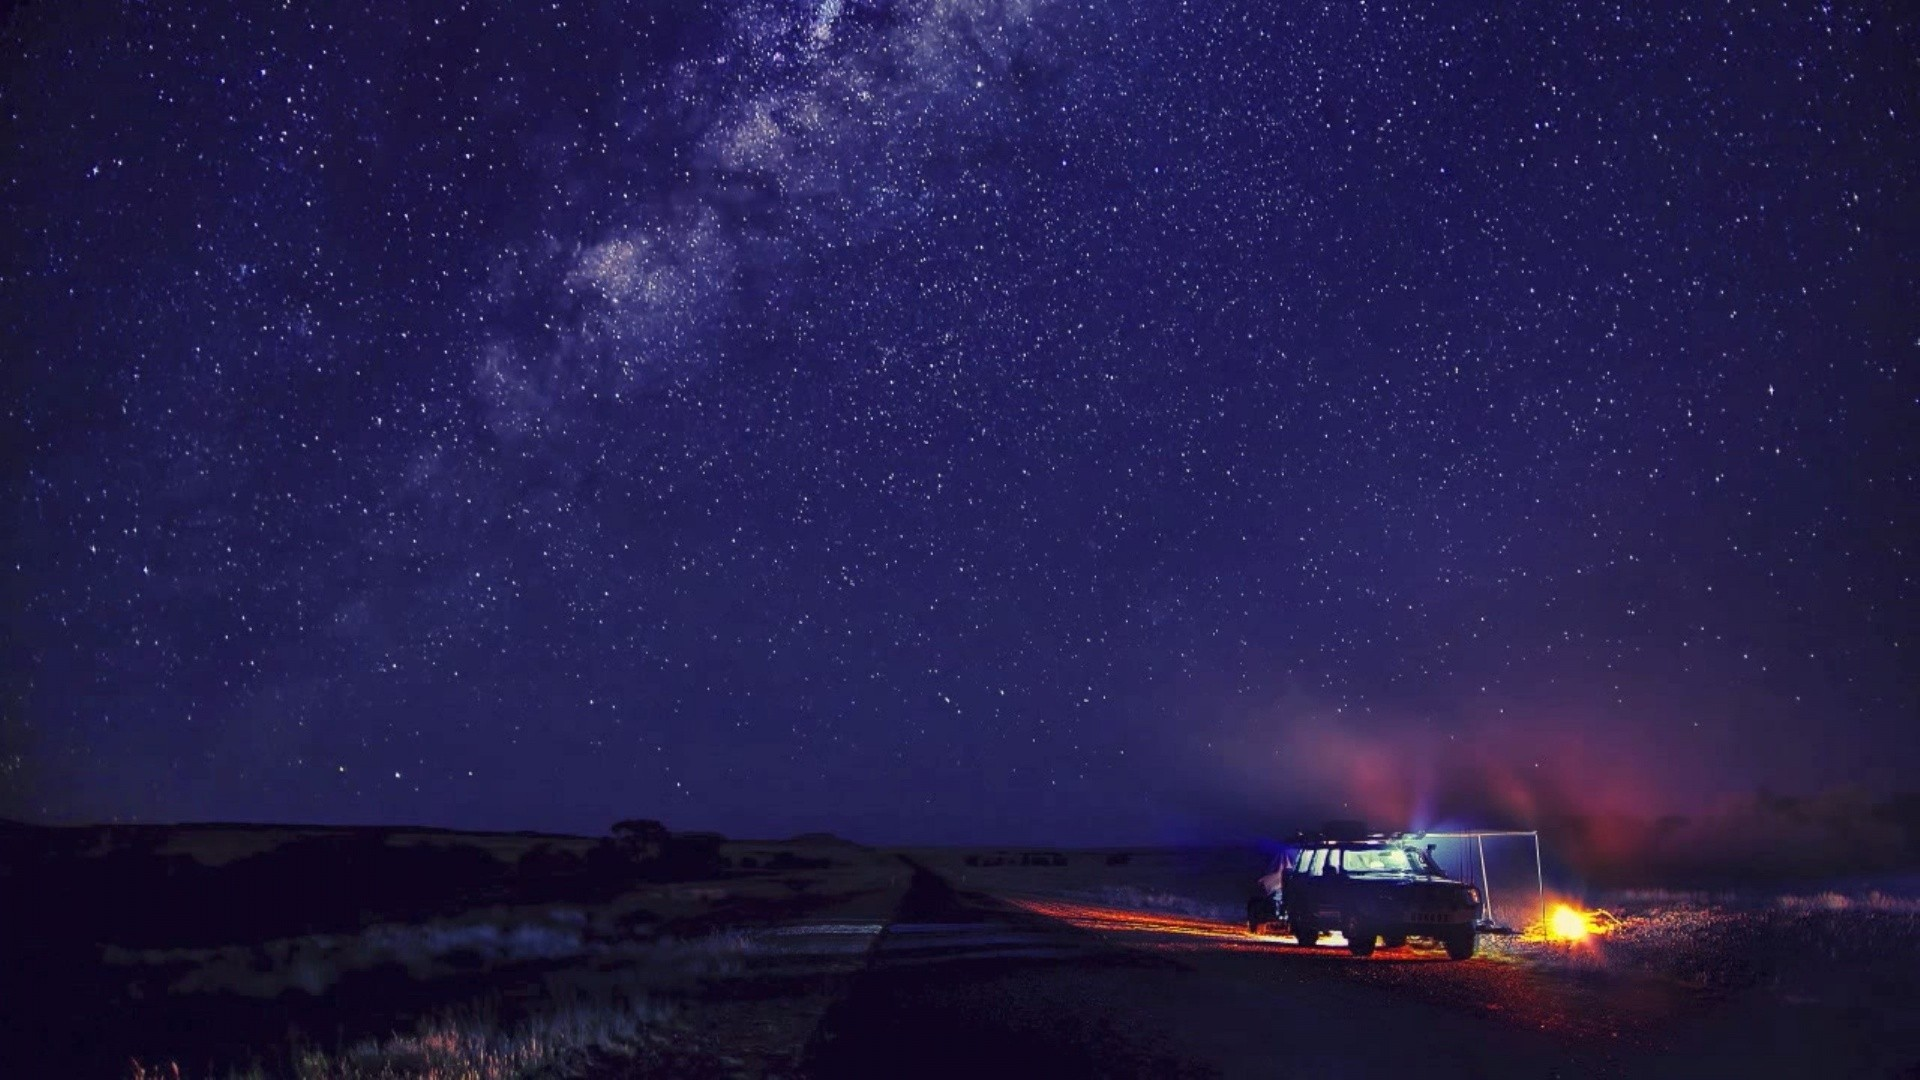 Sky Starry Camp Camping Stars Nature Night Desktop Wallpaper Hd